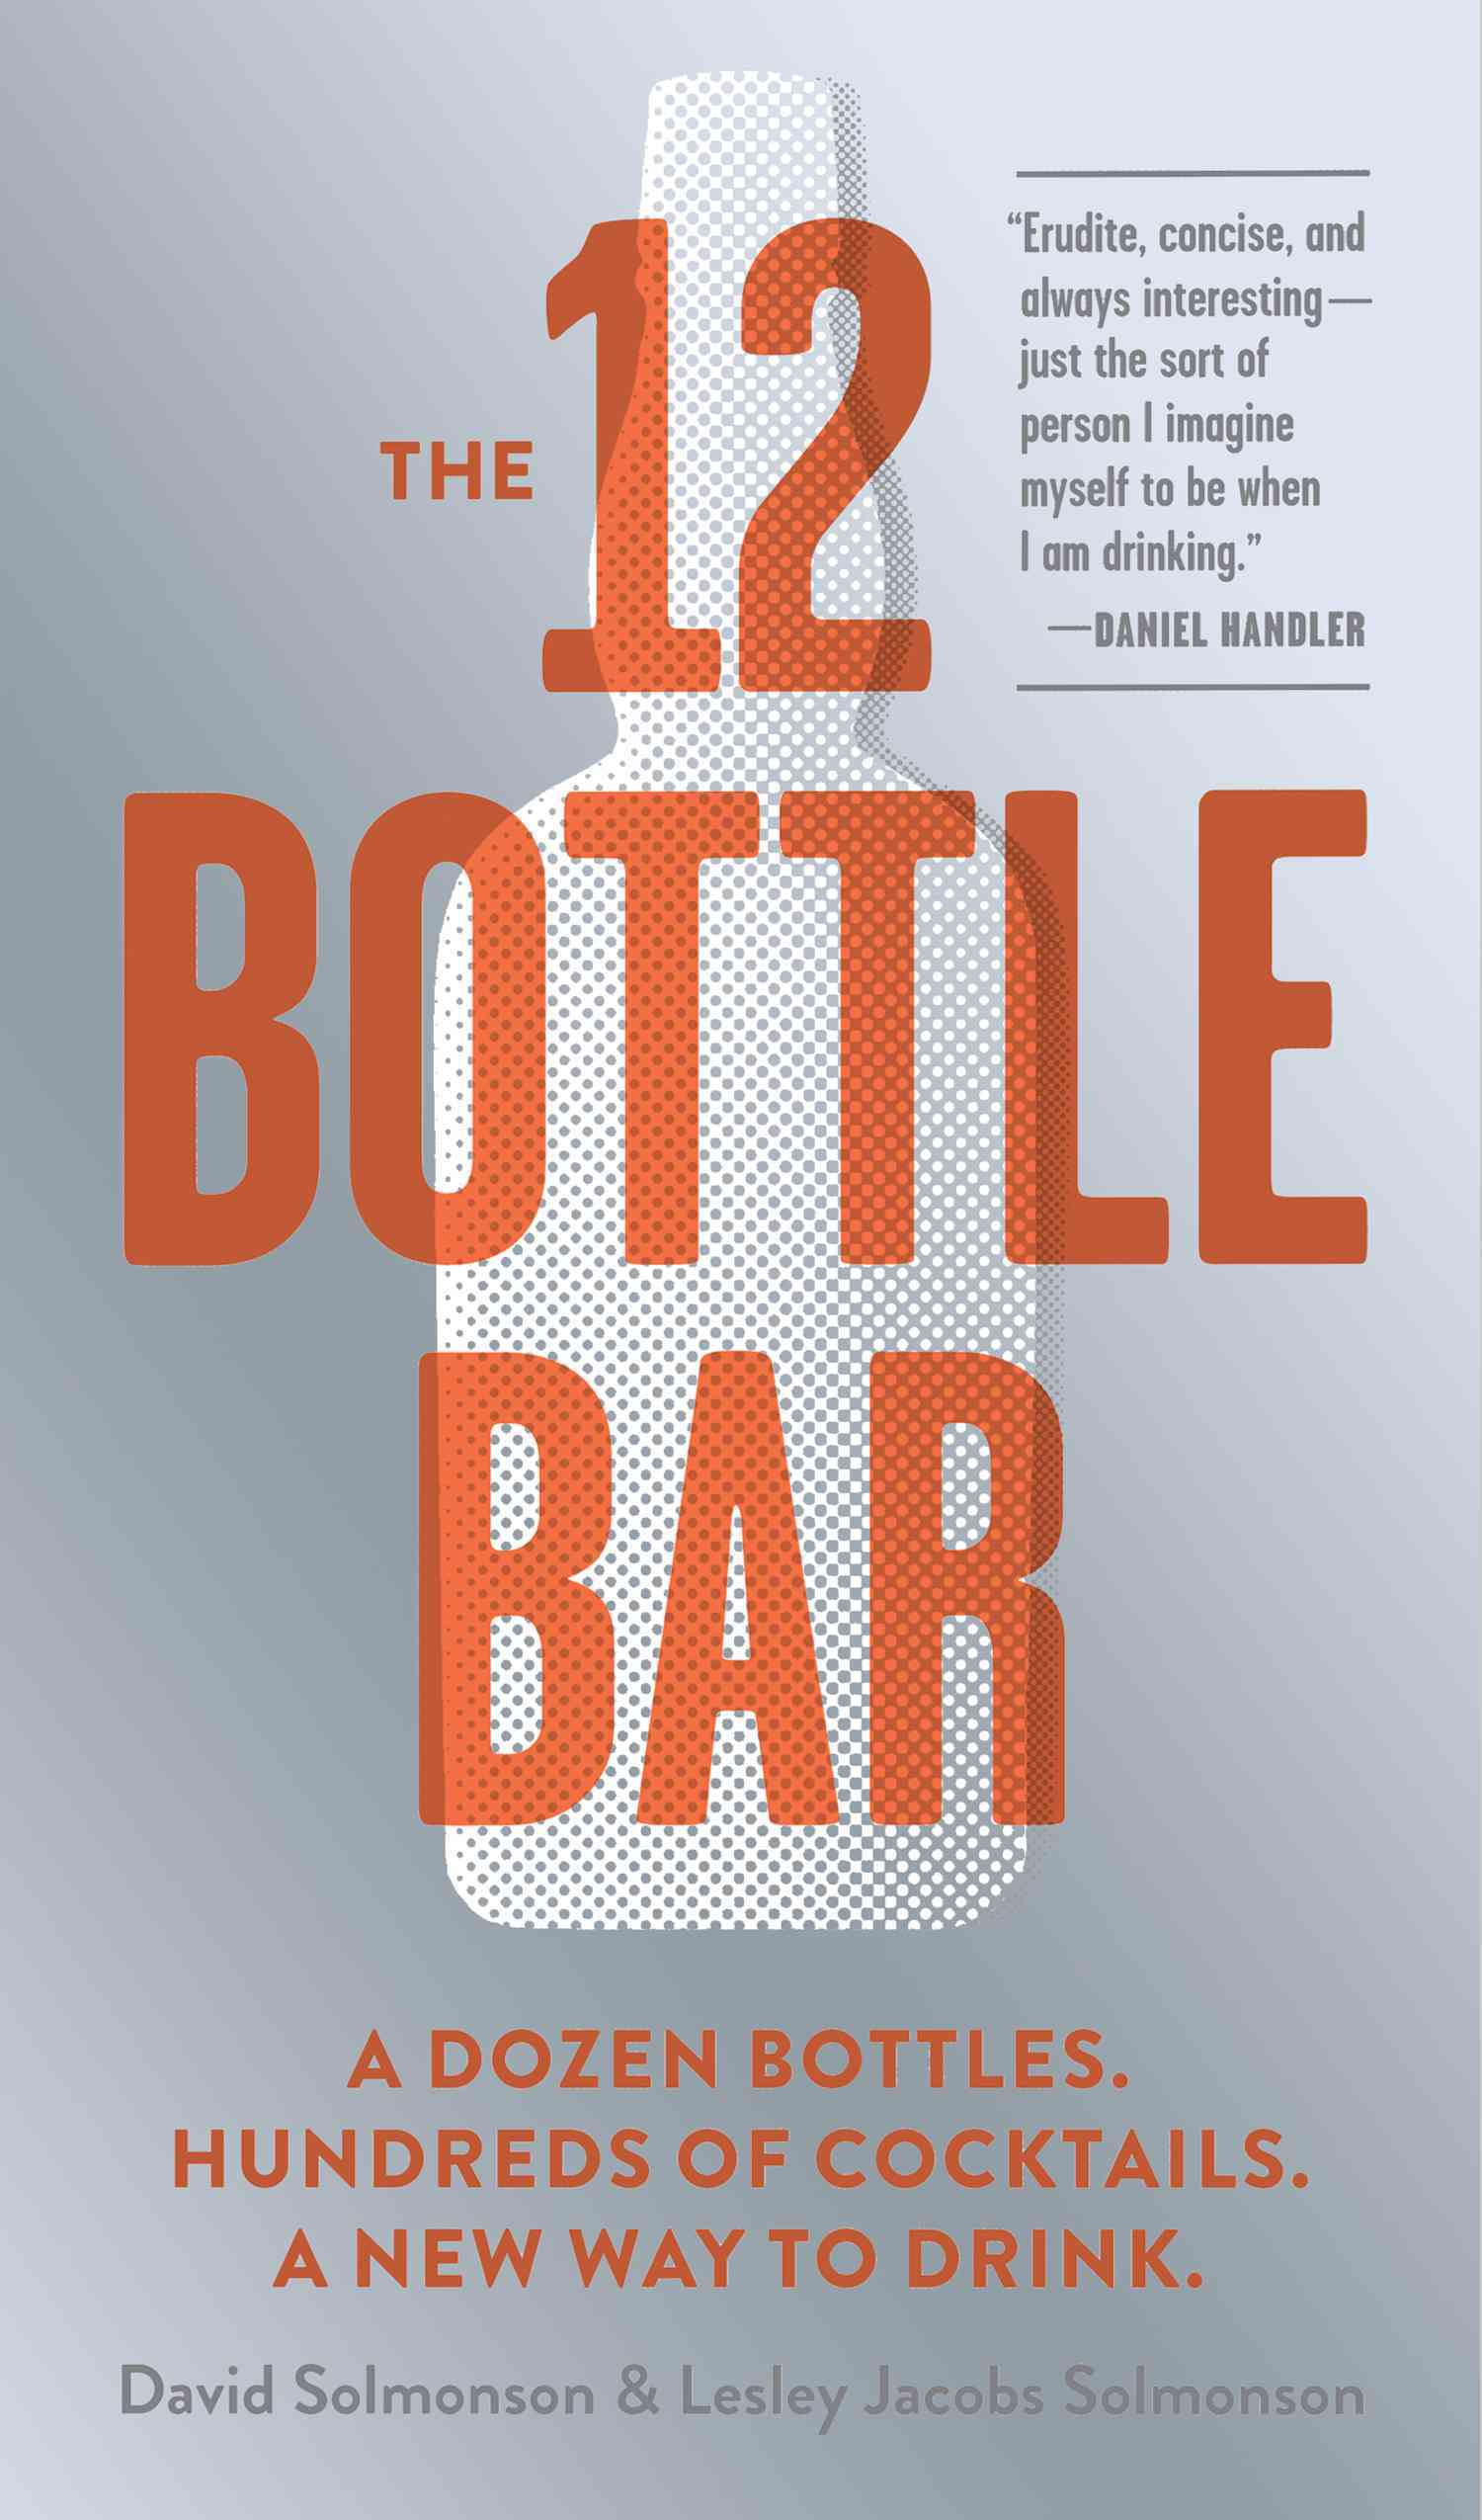 The 12 Bottle Bar By Solmonson, David/ Solmonson, Lesley Jacobs